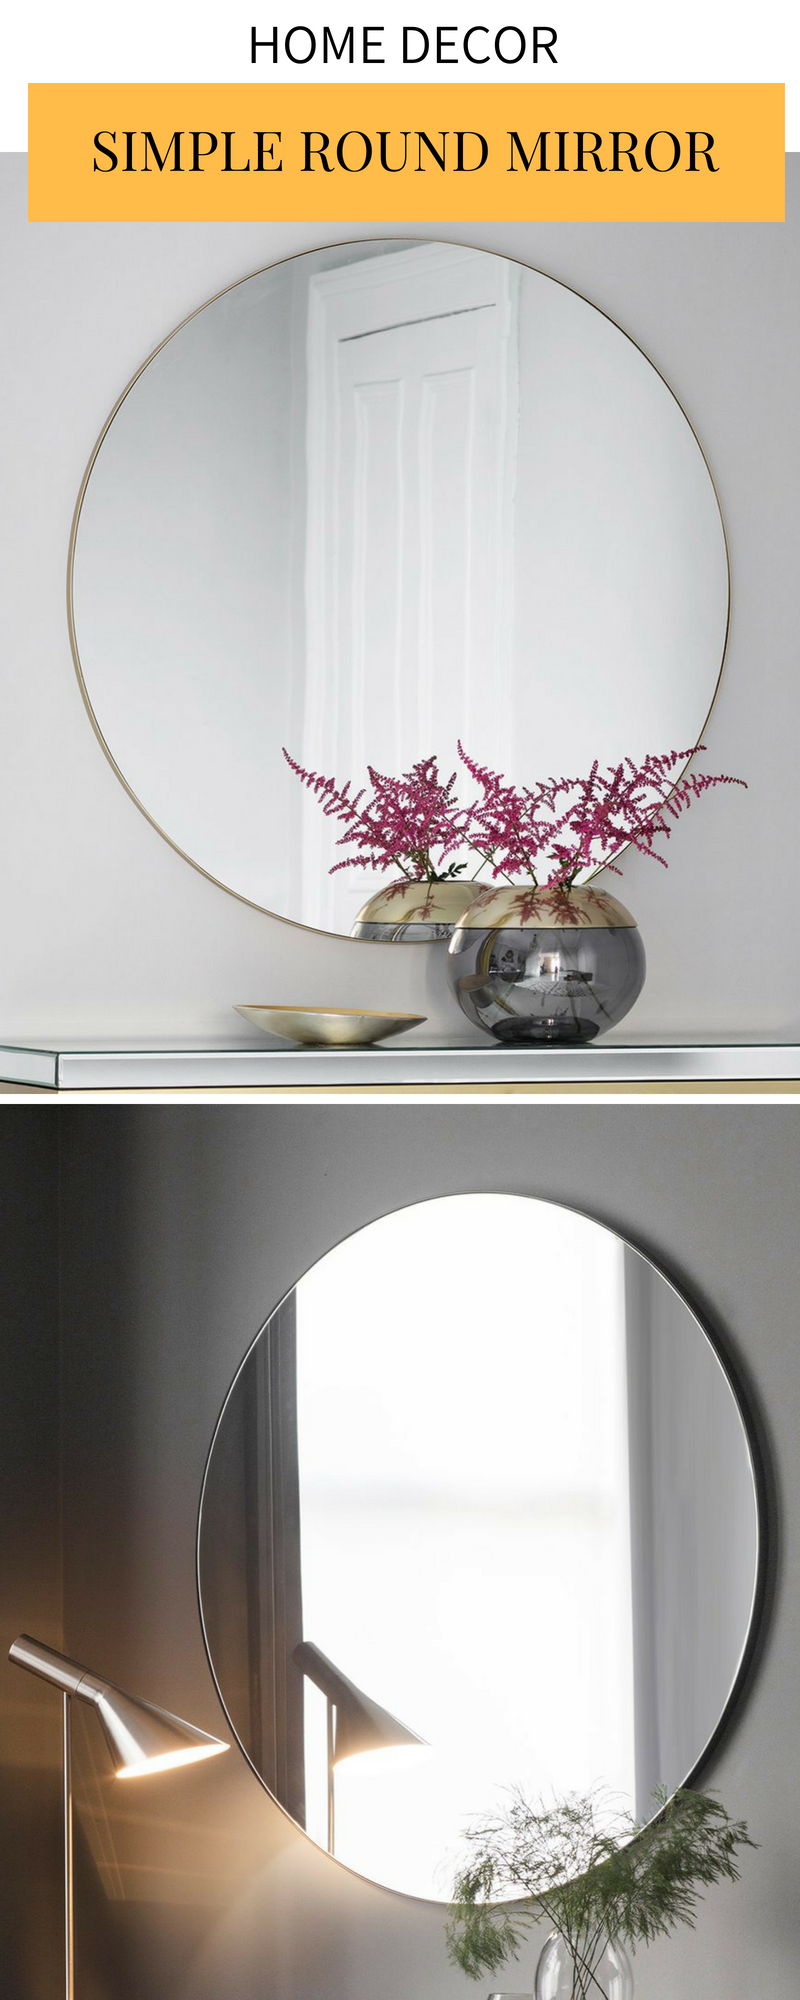 Round thin frame or frameless mirror | Decorating blogs ...